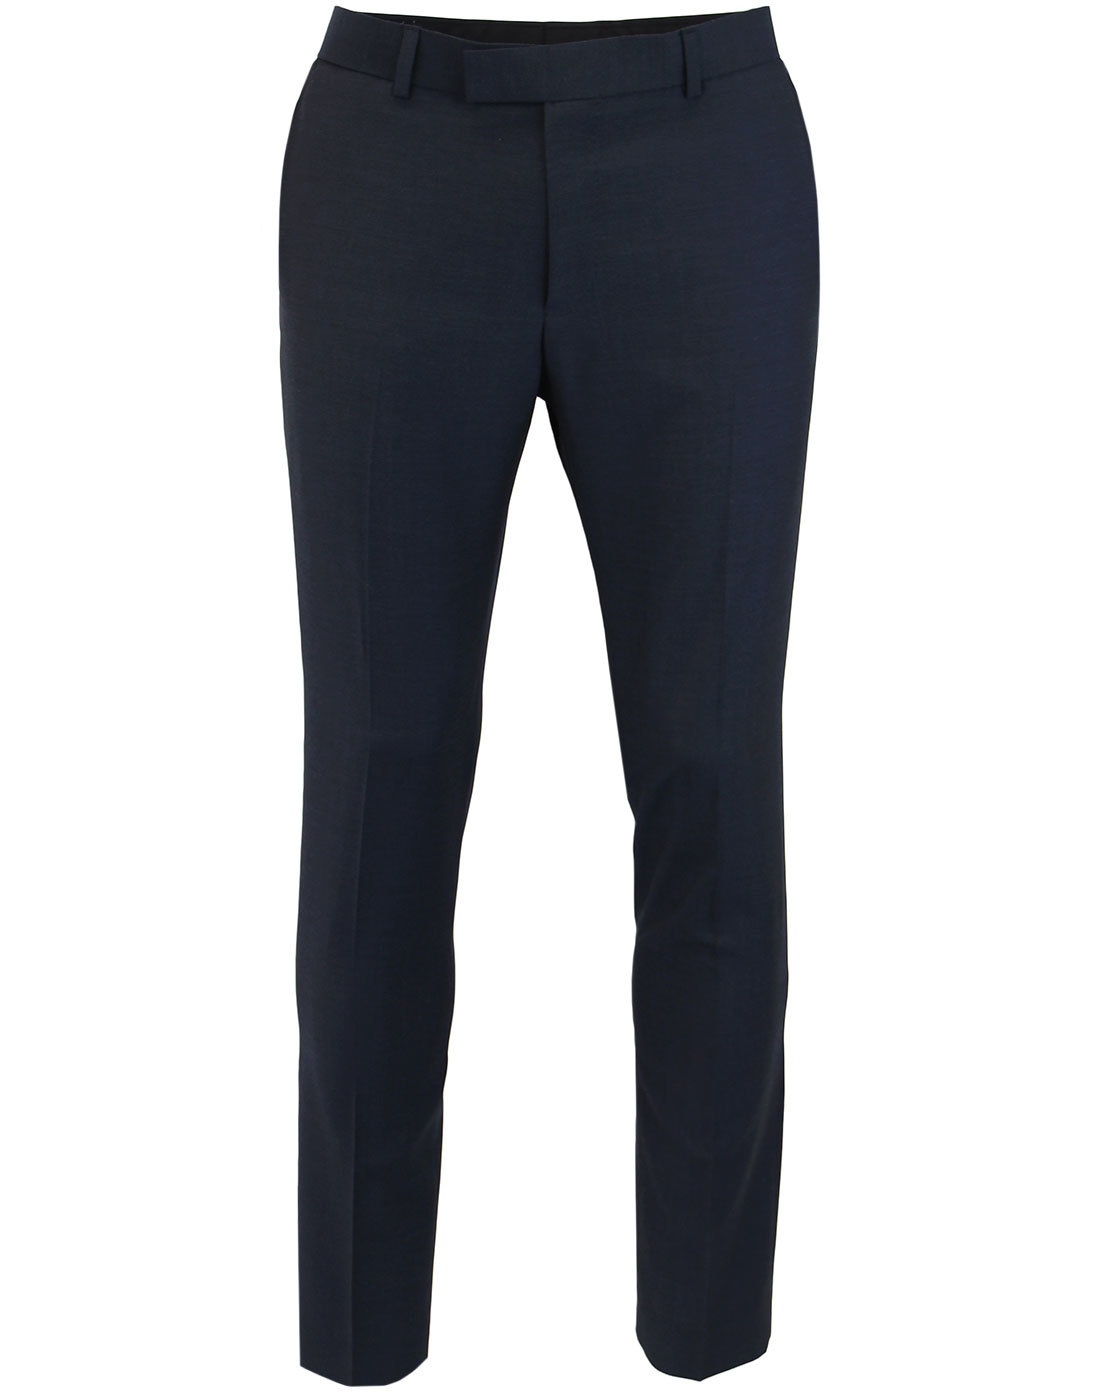 MADCAP ENGLAND Mod Mohair Slim Suit Trousers NAVY